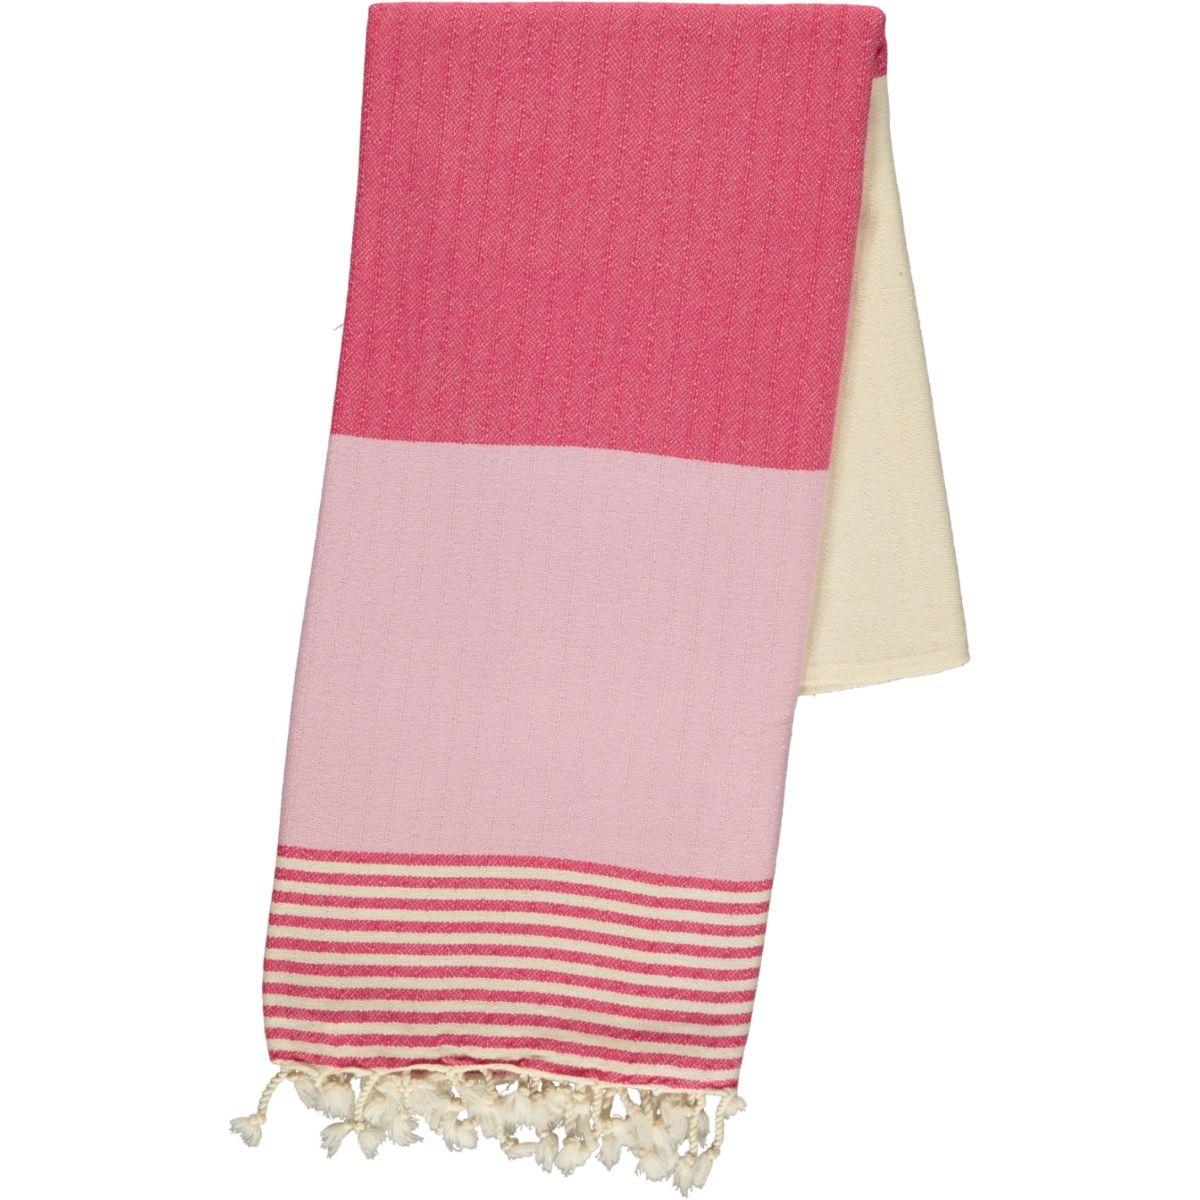 Peshtemal Twin Sultan - Fuchsia / Rose Pink